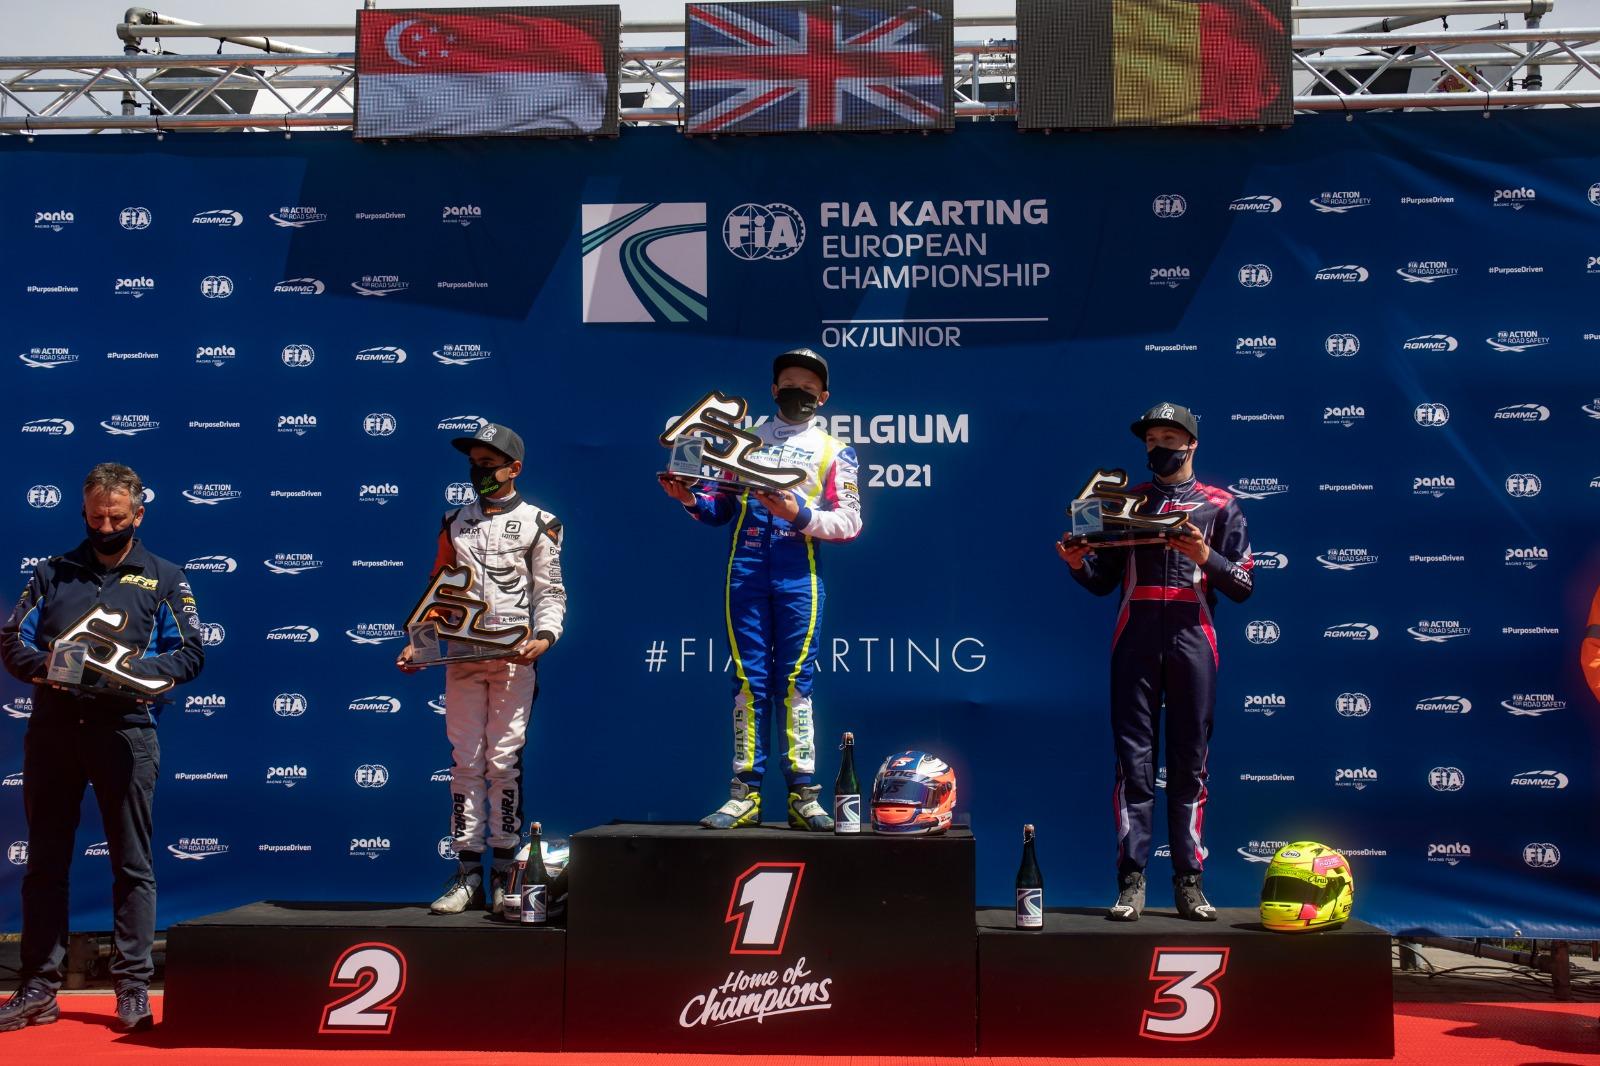 FIA Karting European Championship, Genk - Camara and Slater on top